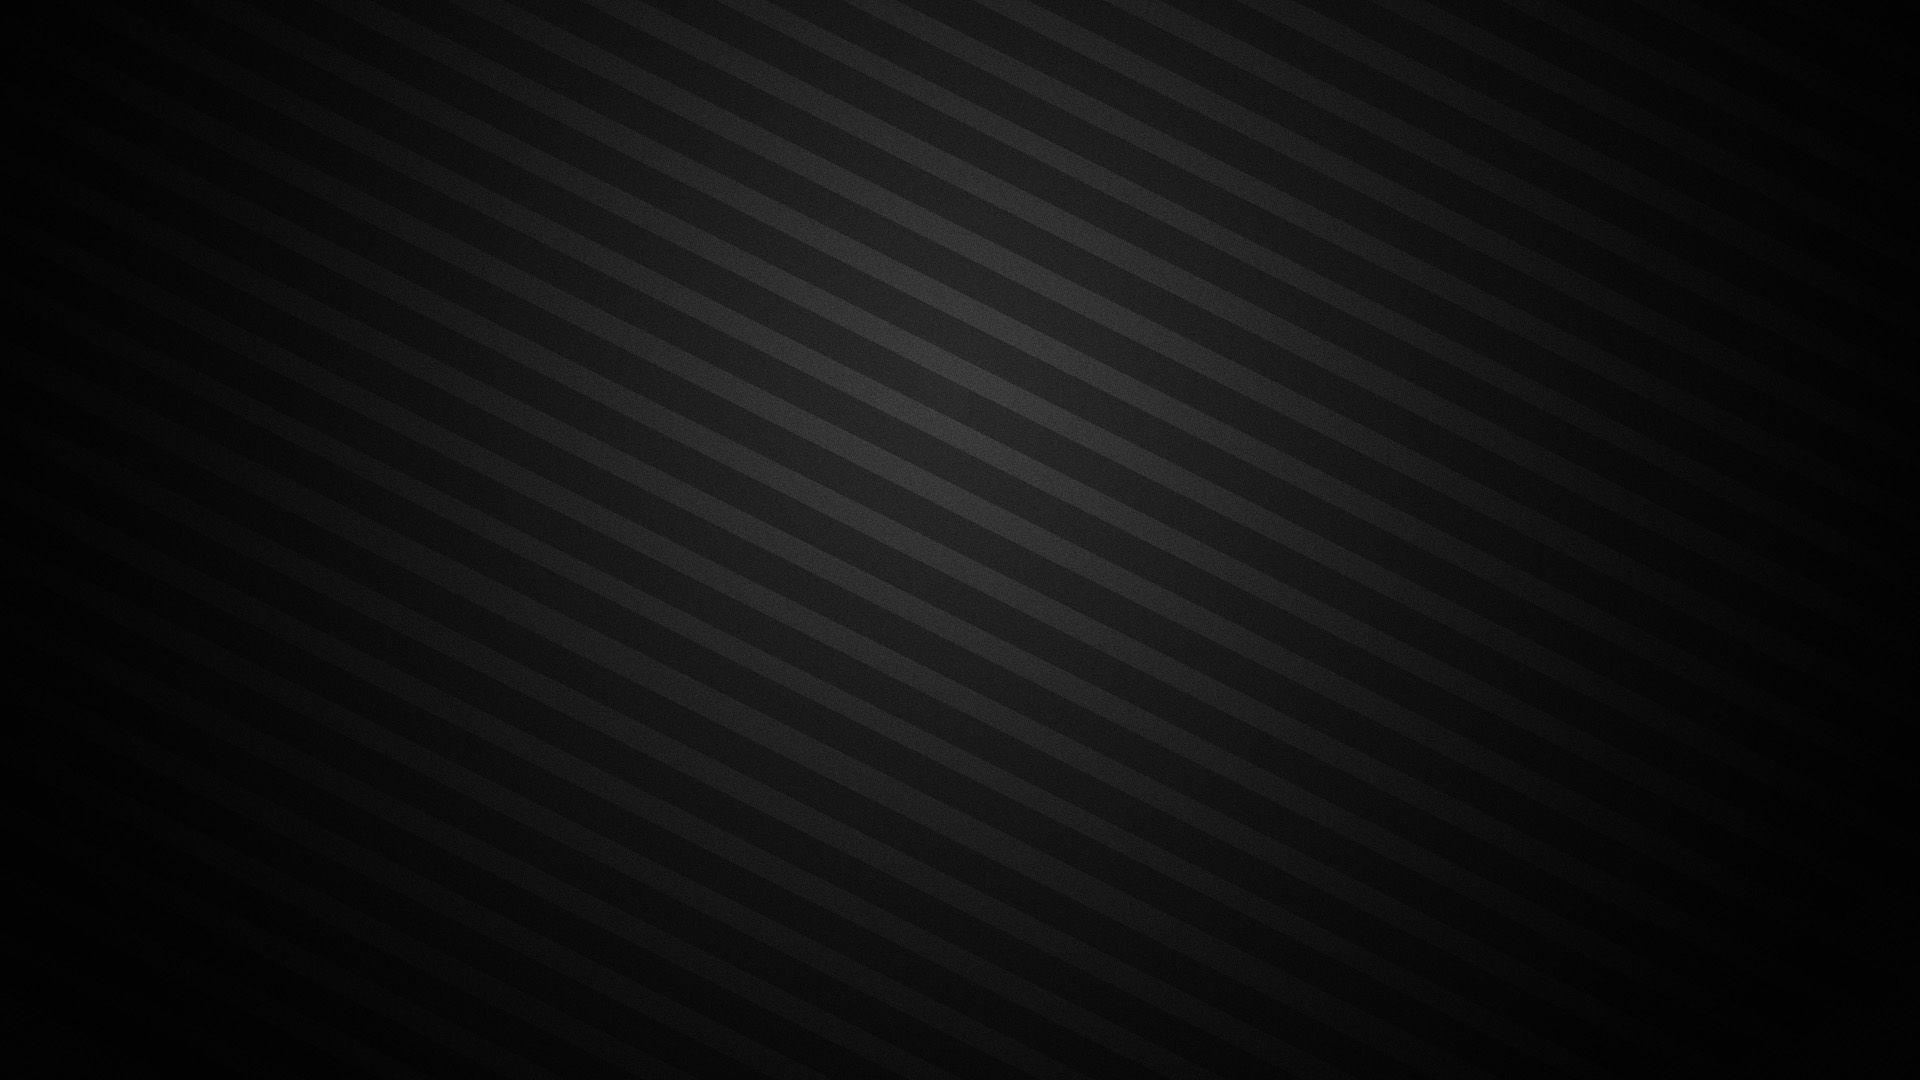 Download Wallpaper 1920x1080 Patterns, Flooring, Background ...